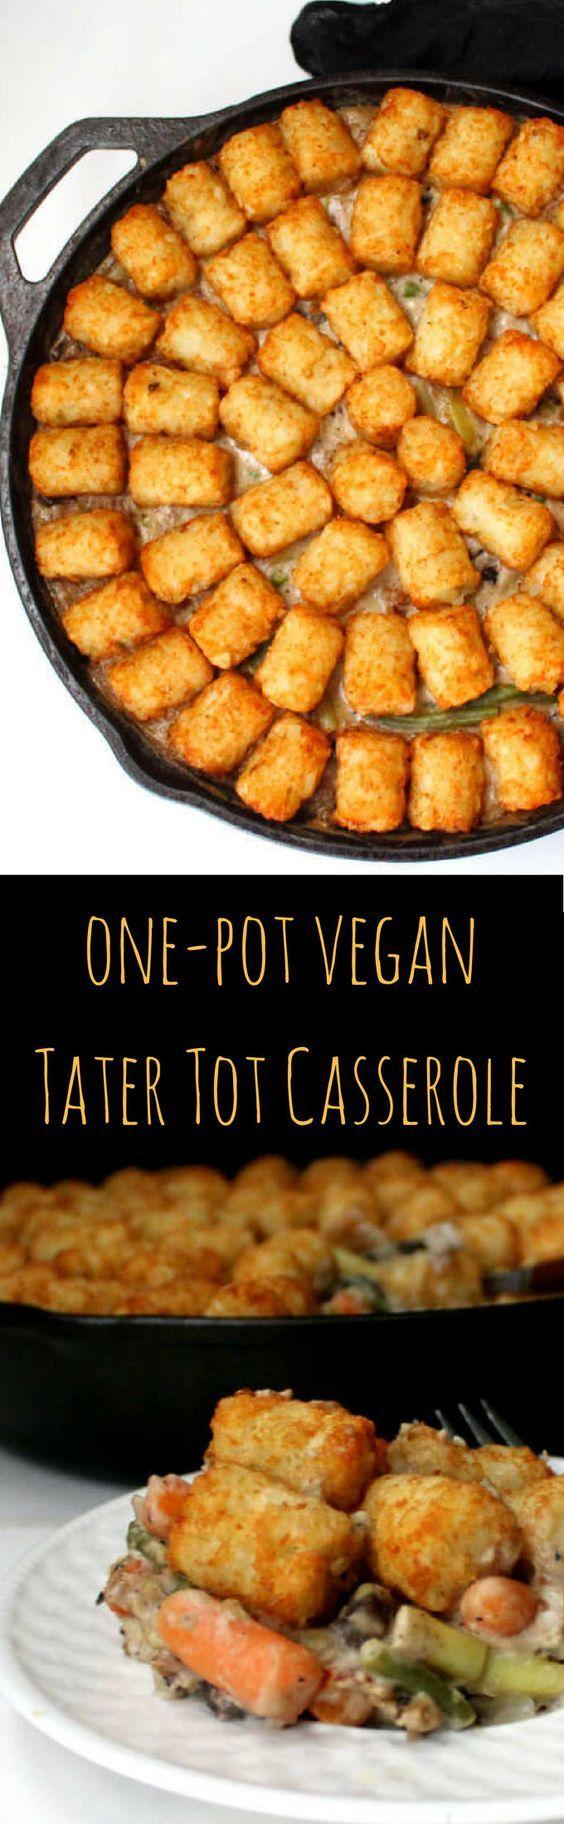 One Pot Vegan Tater Tot Casserole